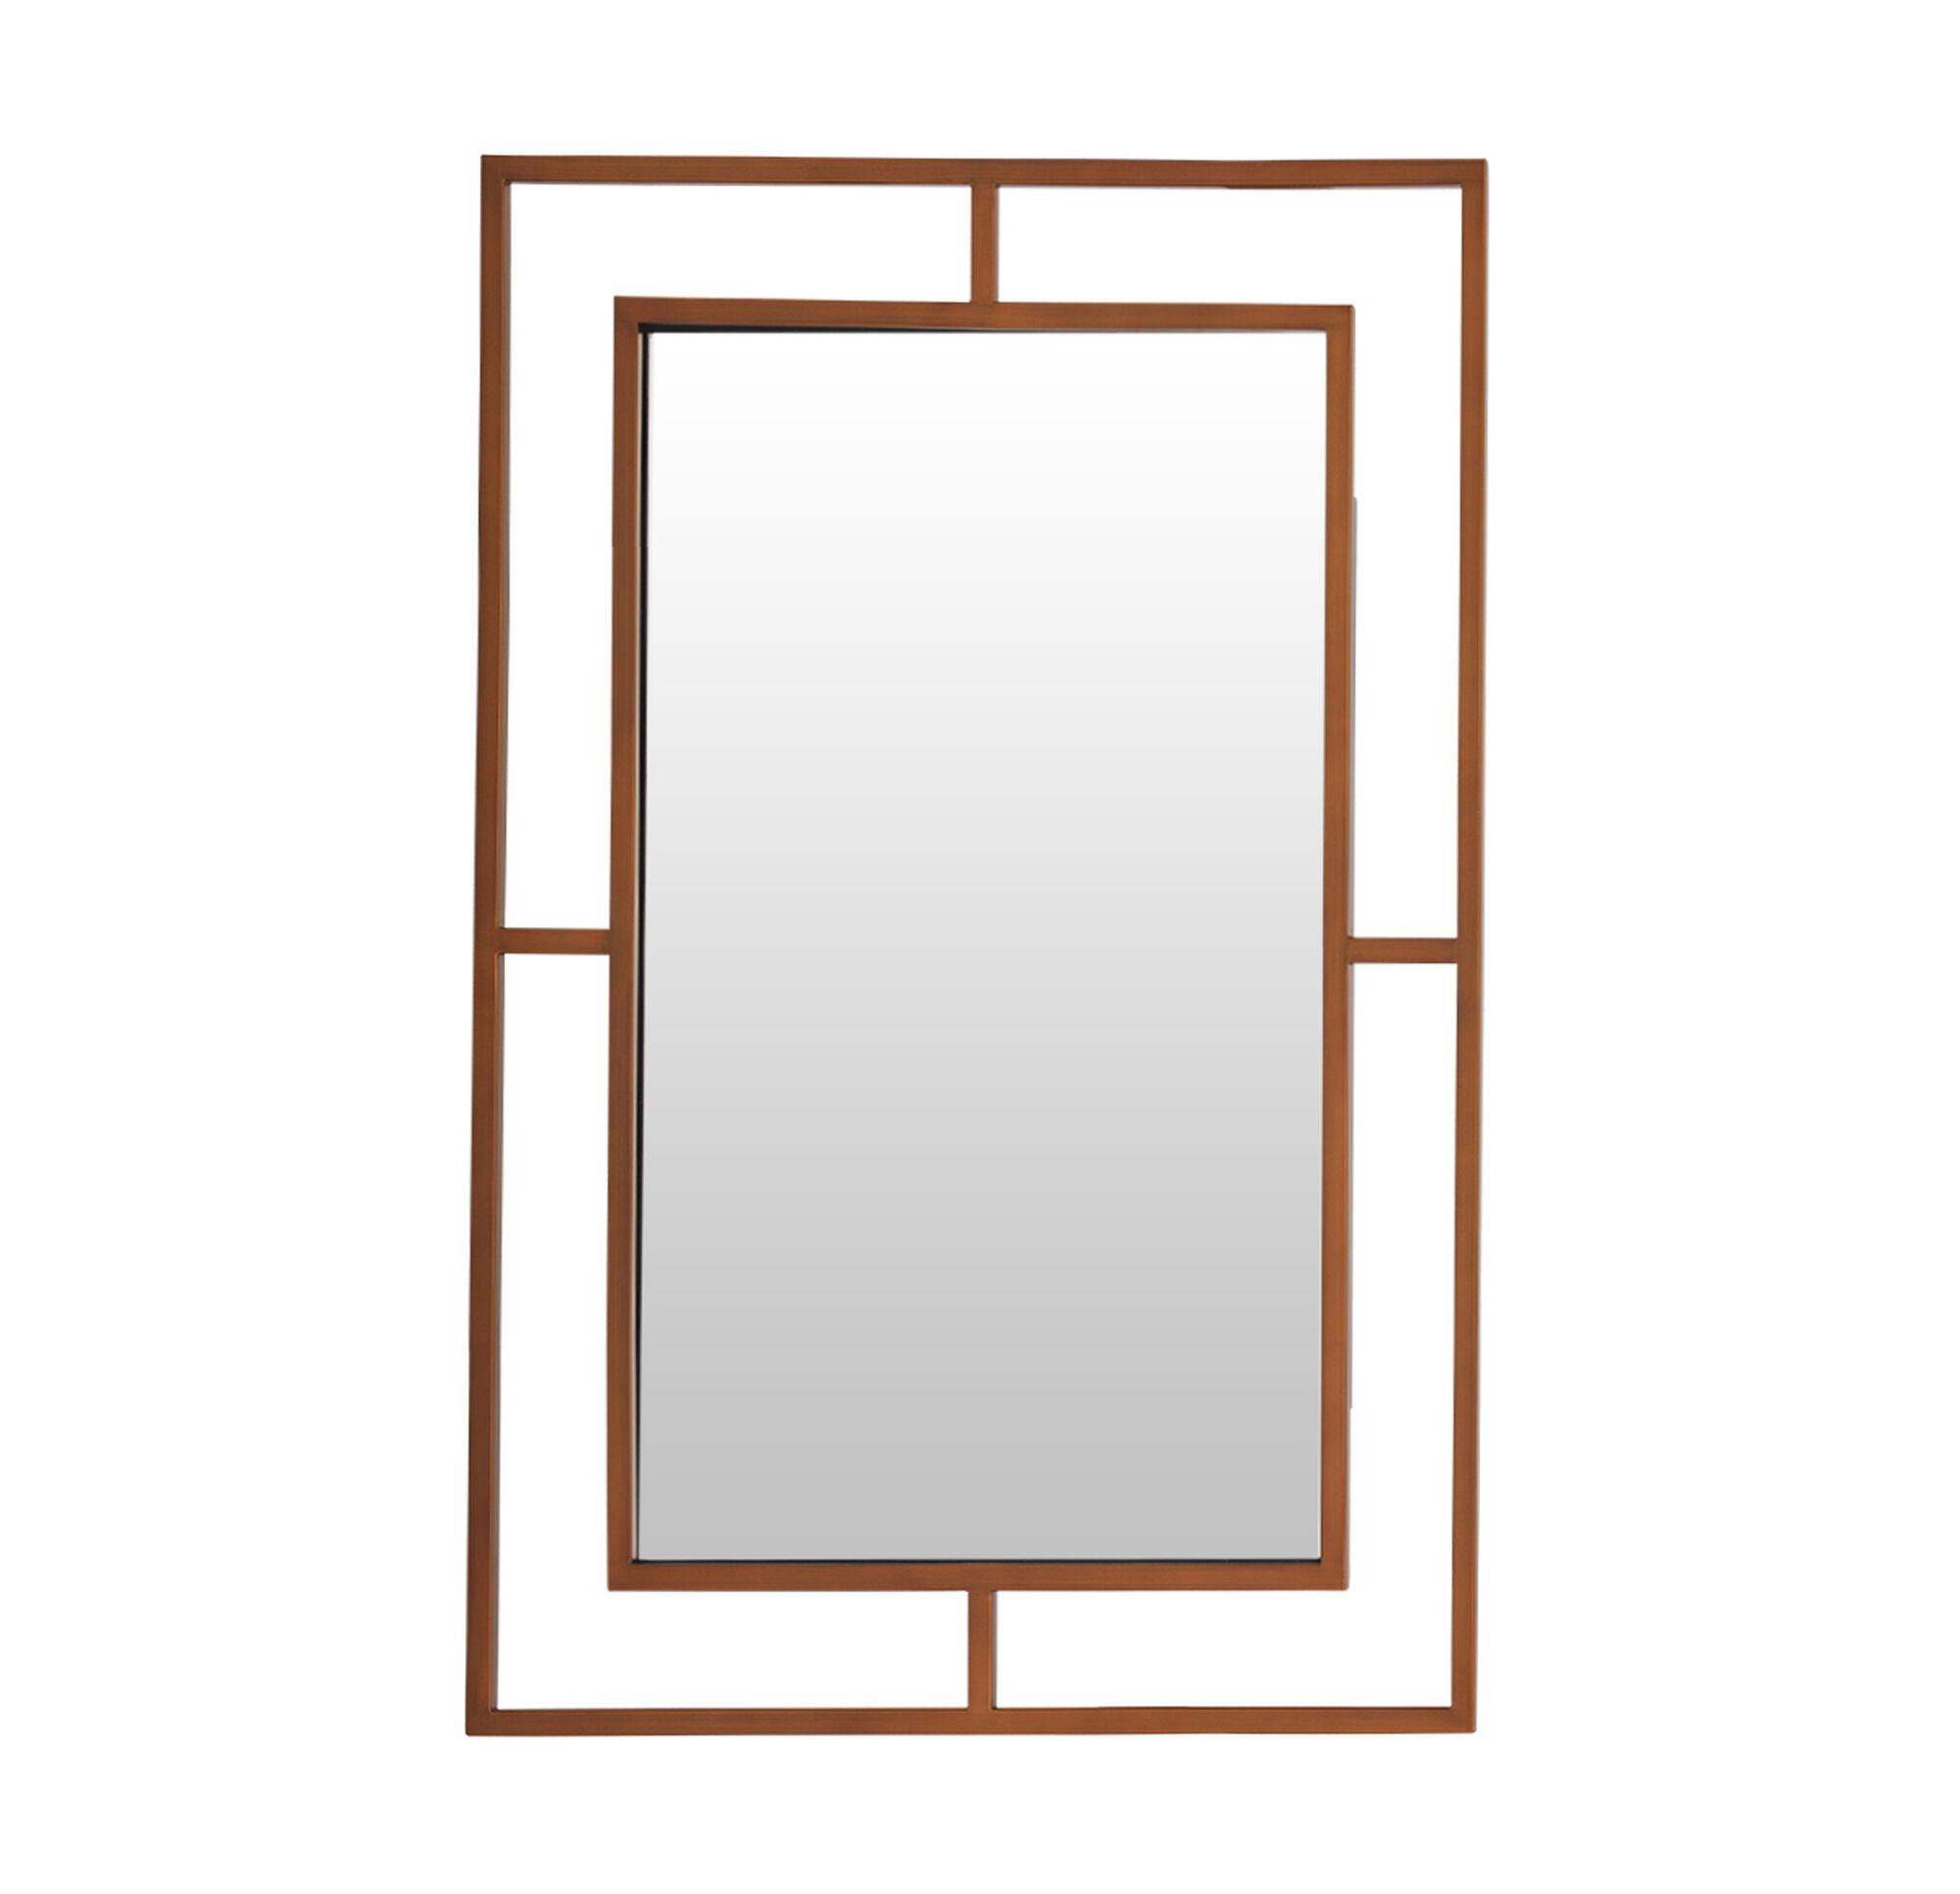 mirror. MING LARGE MIRROR - SATIN BRASS, , Hi-res Mirror